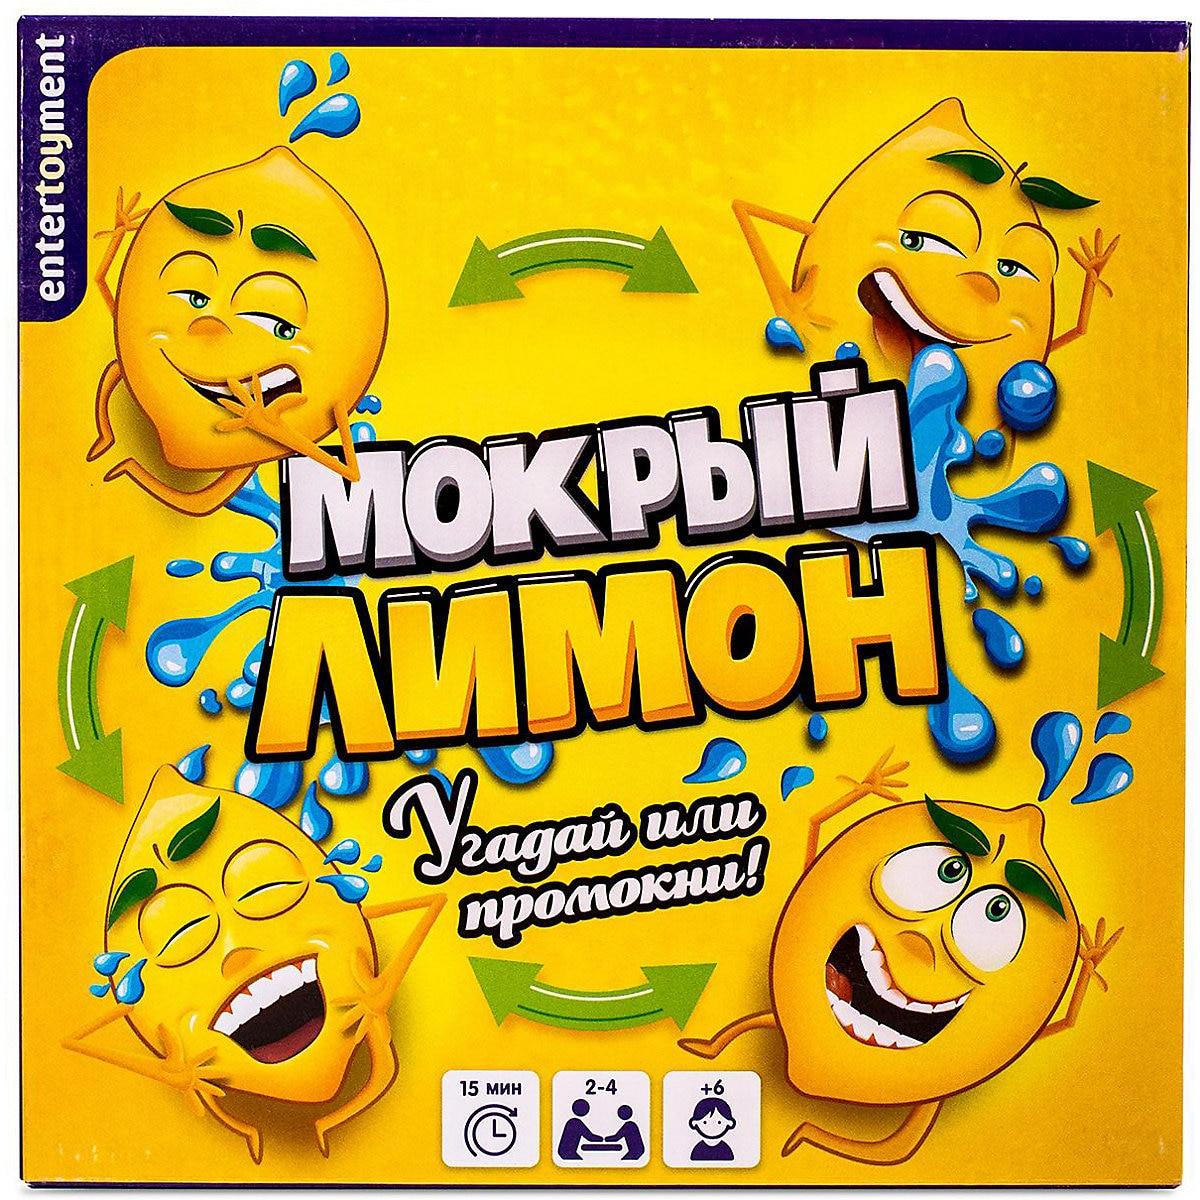 цена на Game Room ENTERTOYMENT 10015788 toys board game children's educational games roomfor boys girls